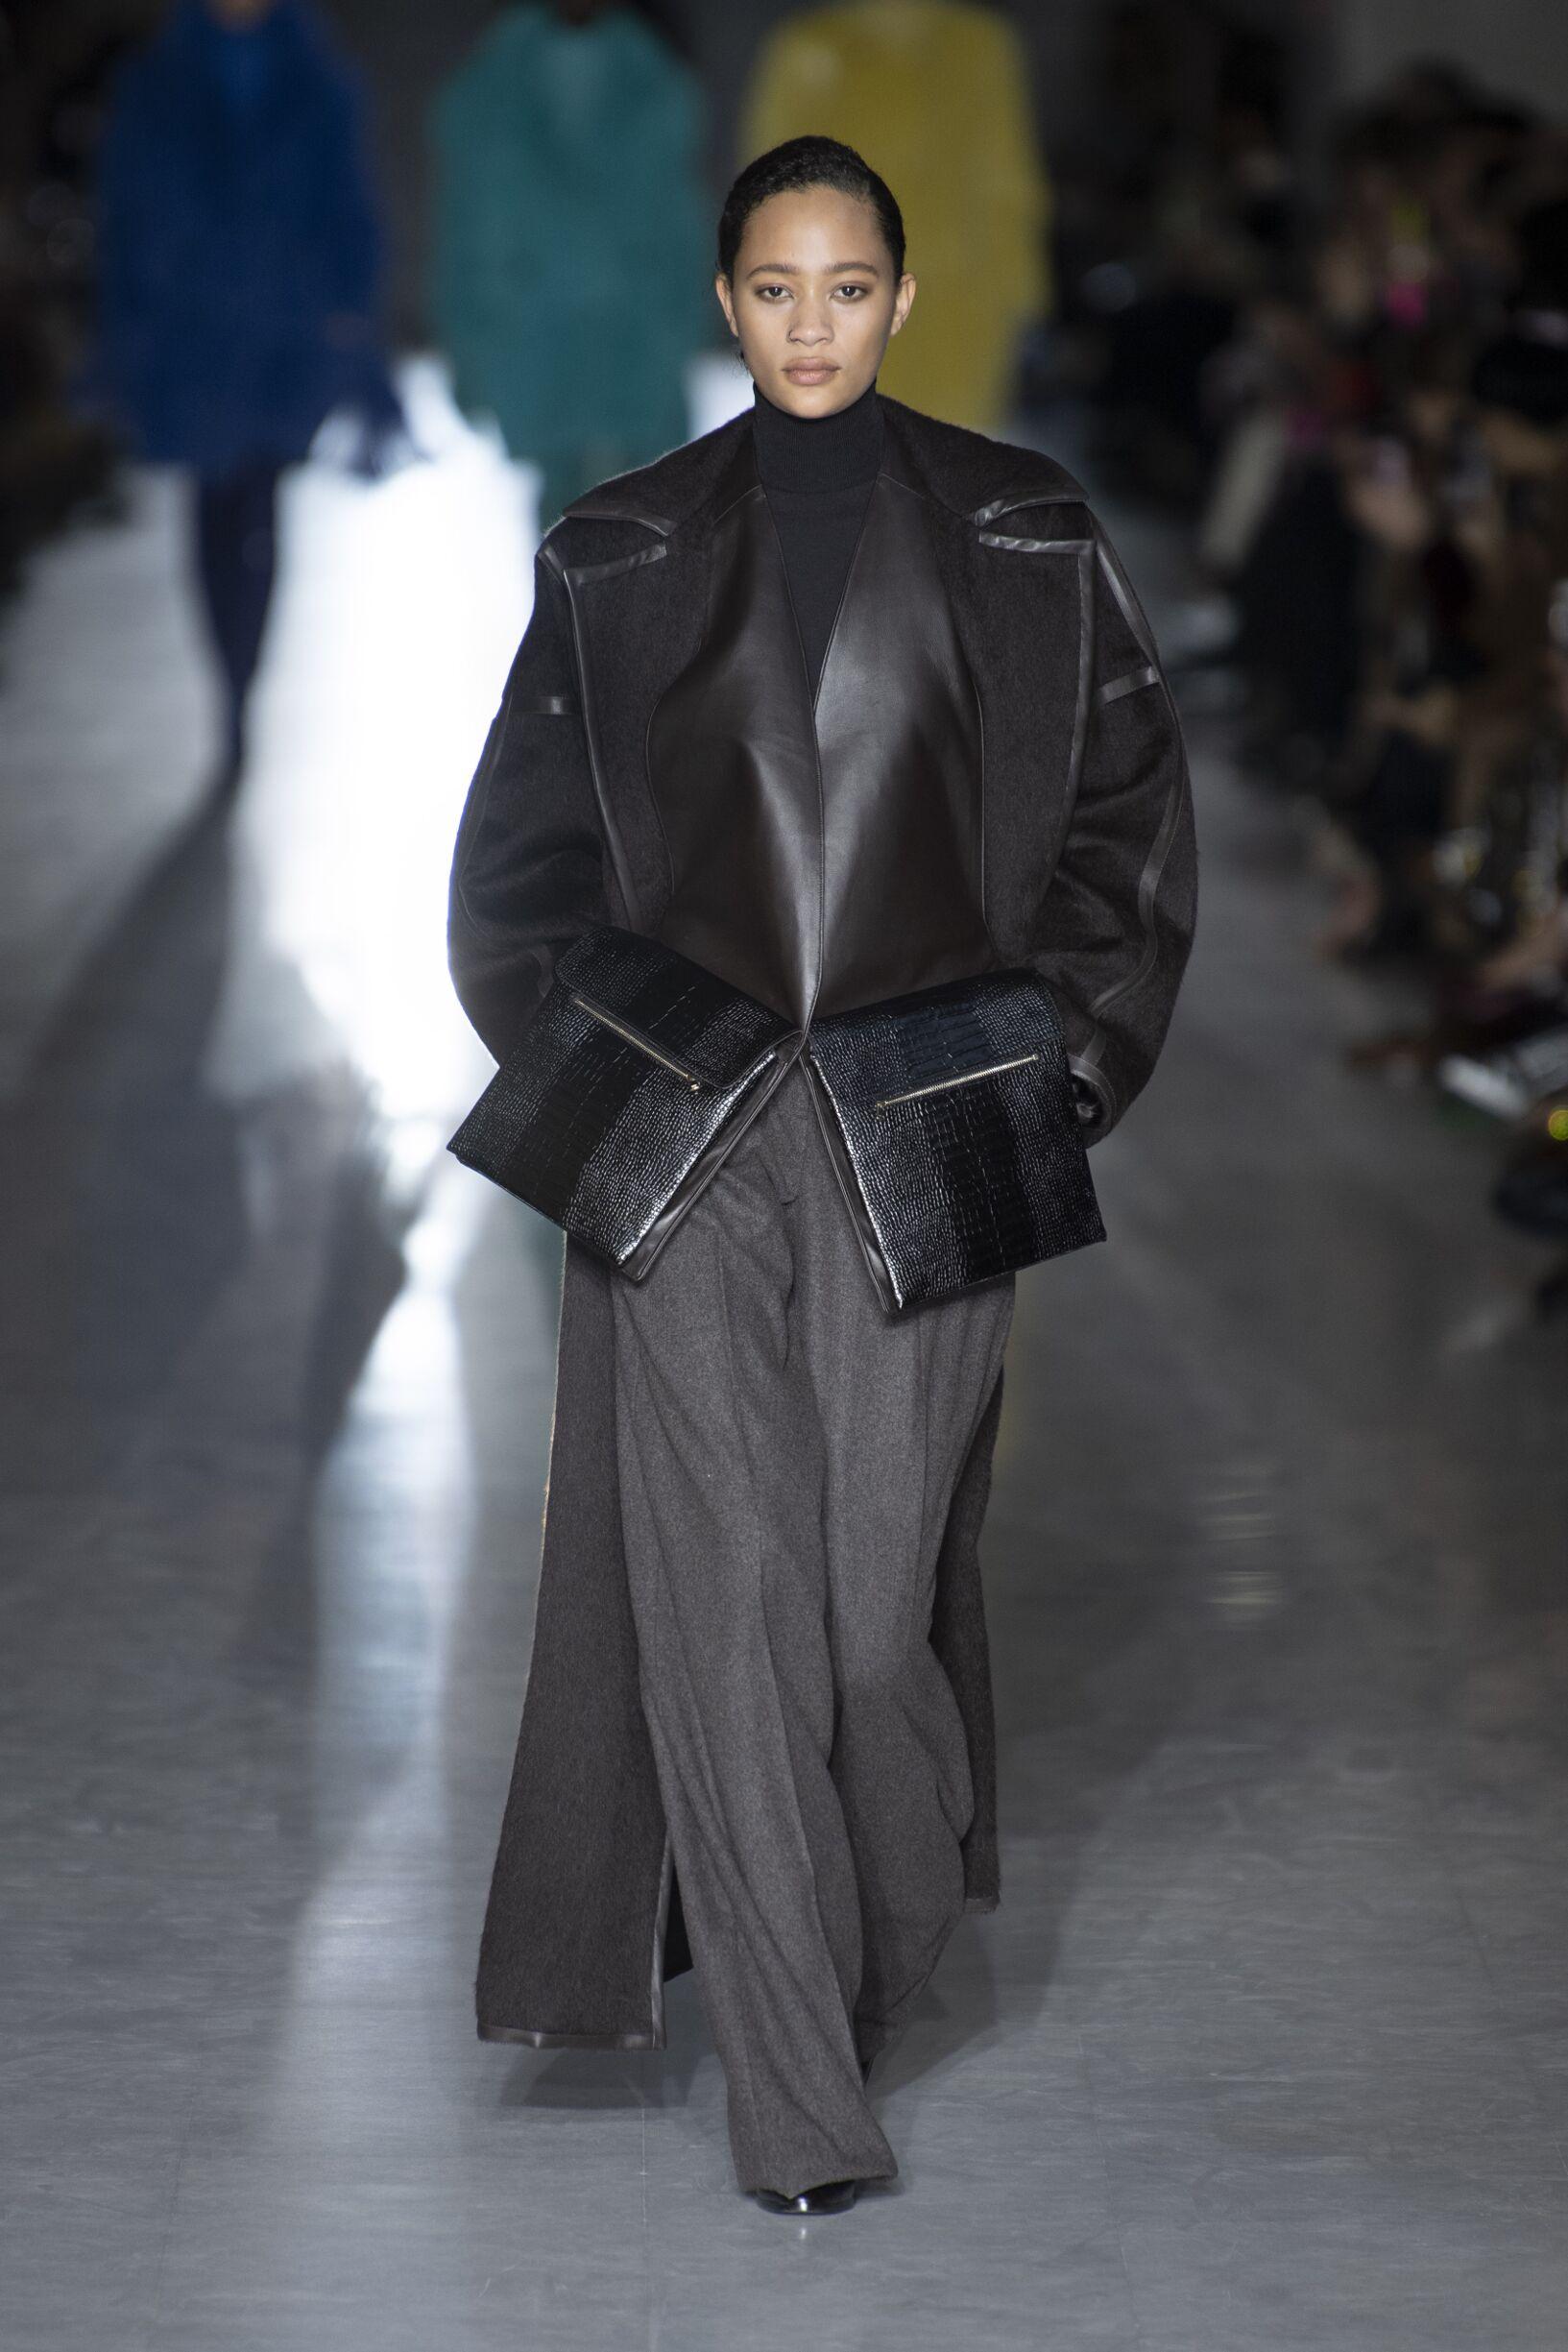 Catwalk Max Mara Woman Fashion Show Winter 2019